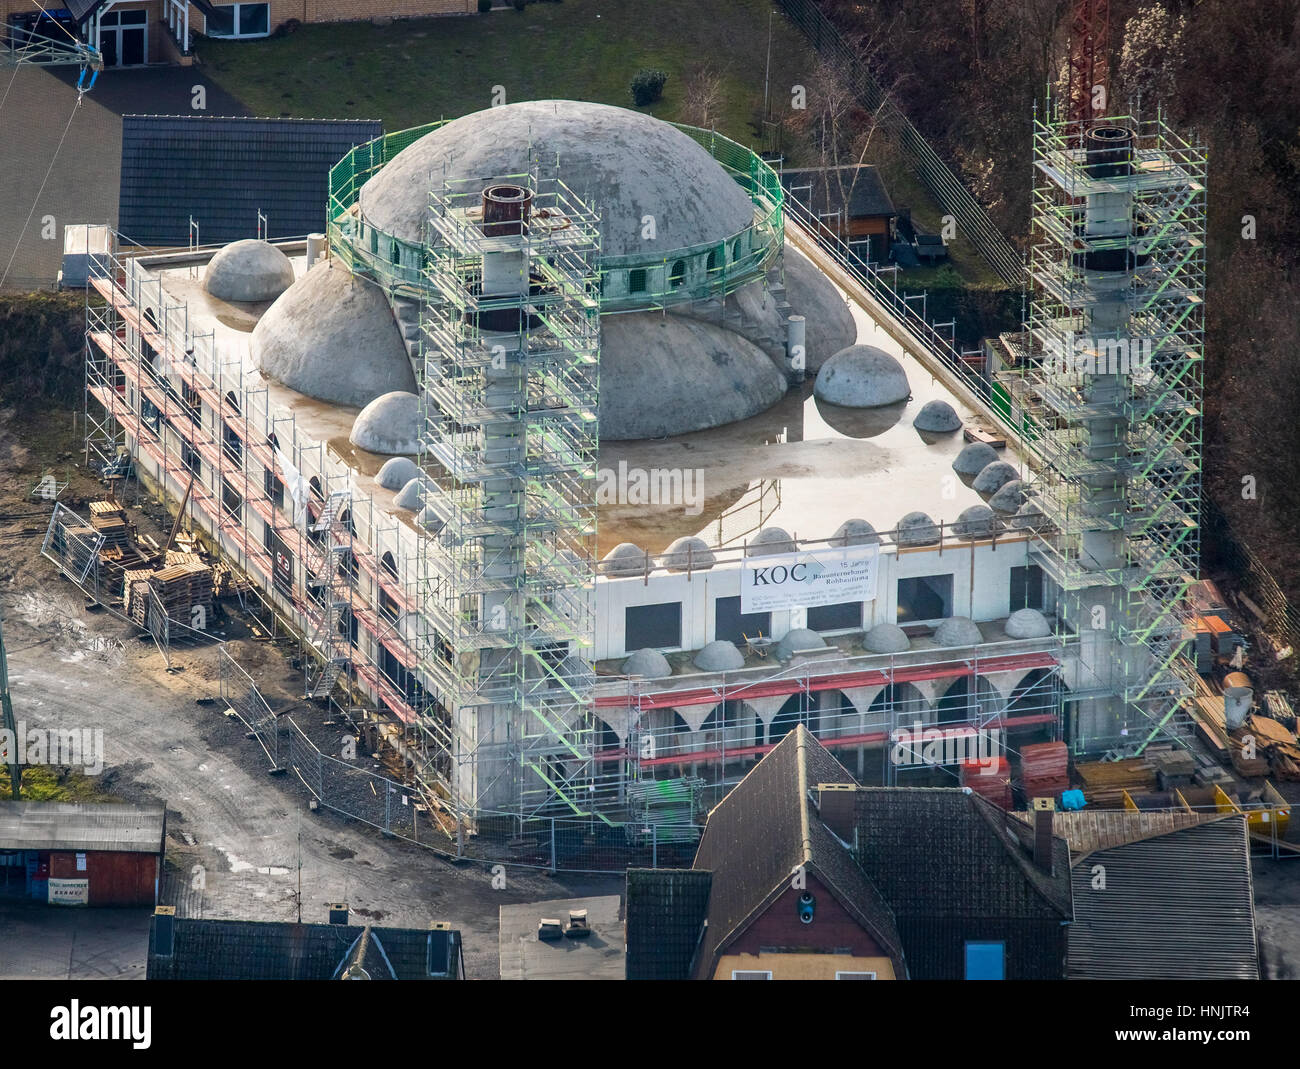 New Herringer Mosque on Dortmunderstraße, under construction, cladding minarets, Hamm, Ruhr area, North Rhine - Stock Image